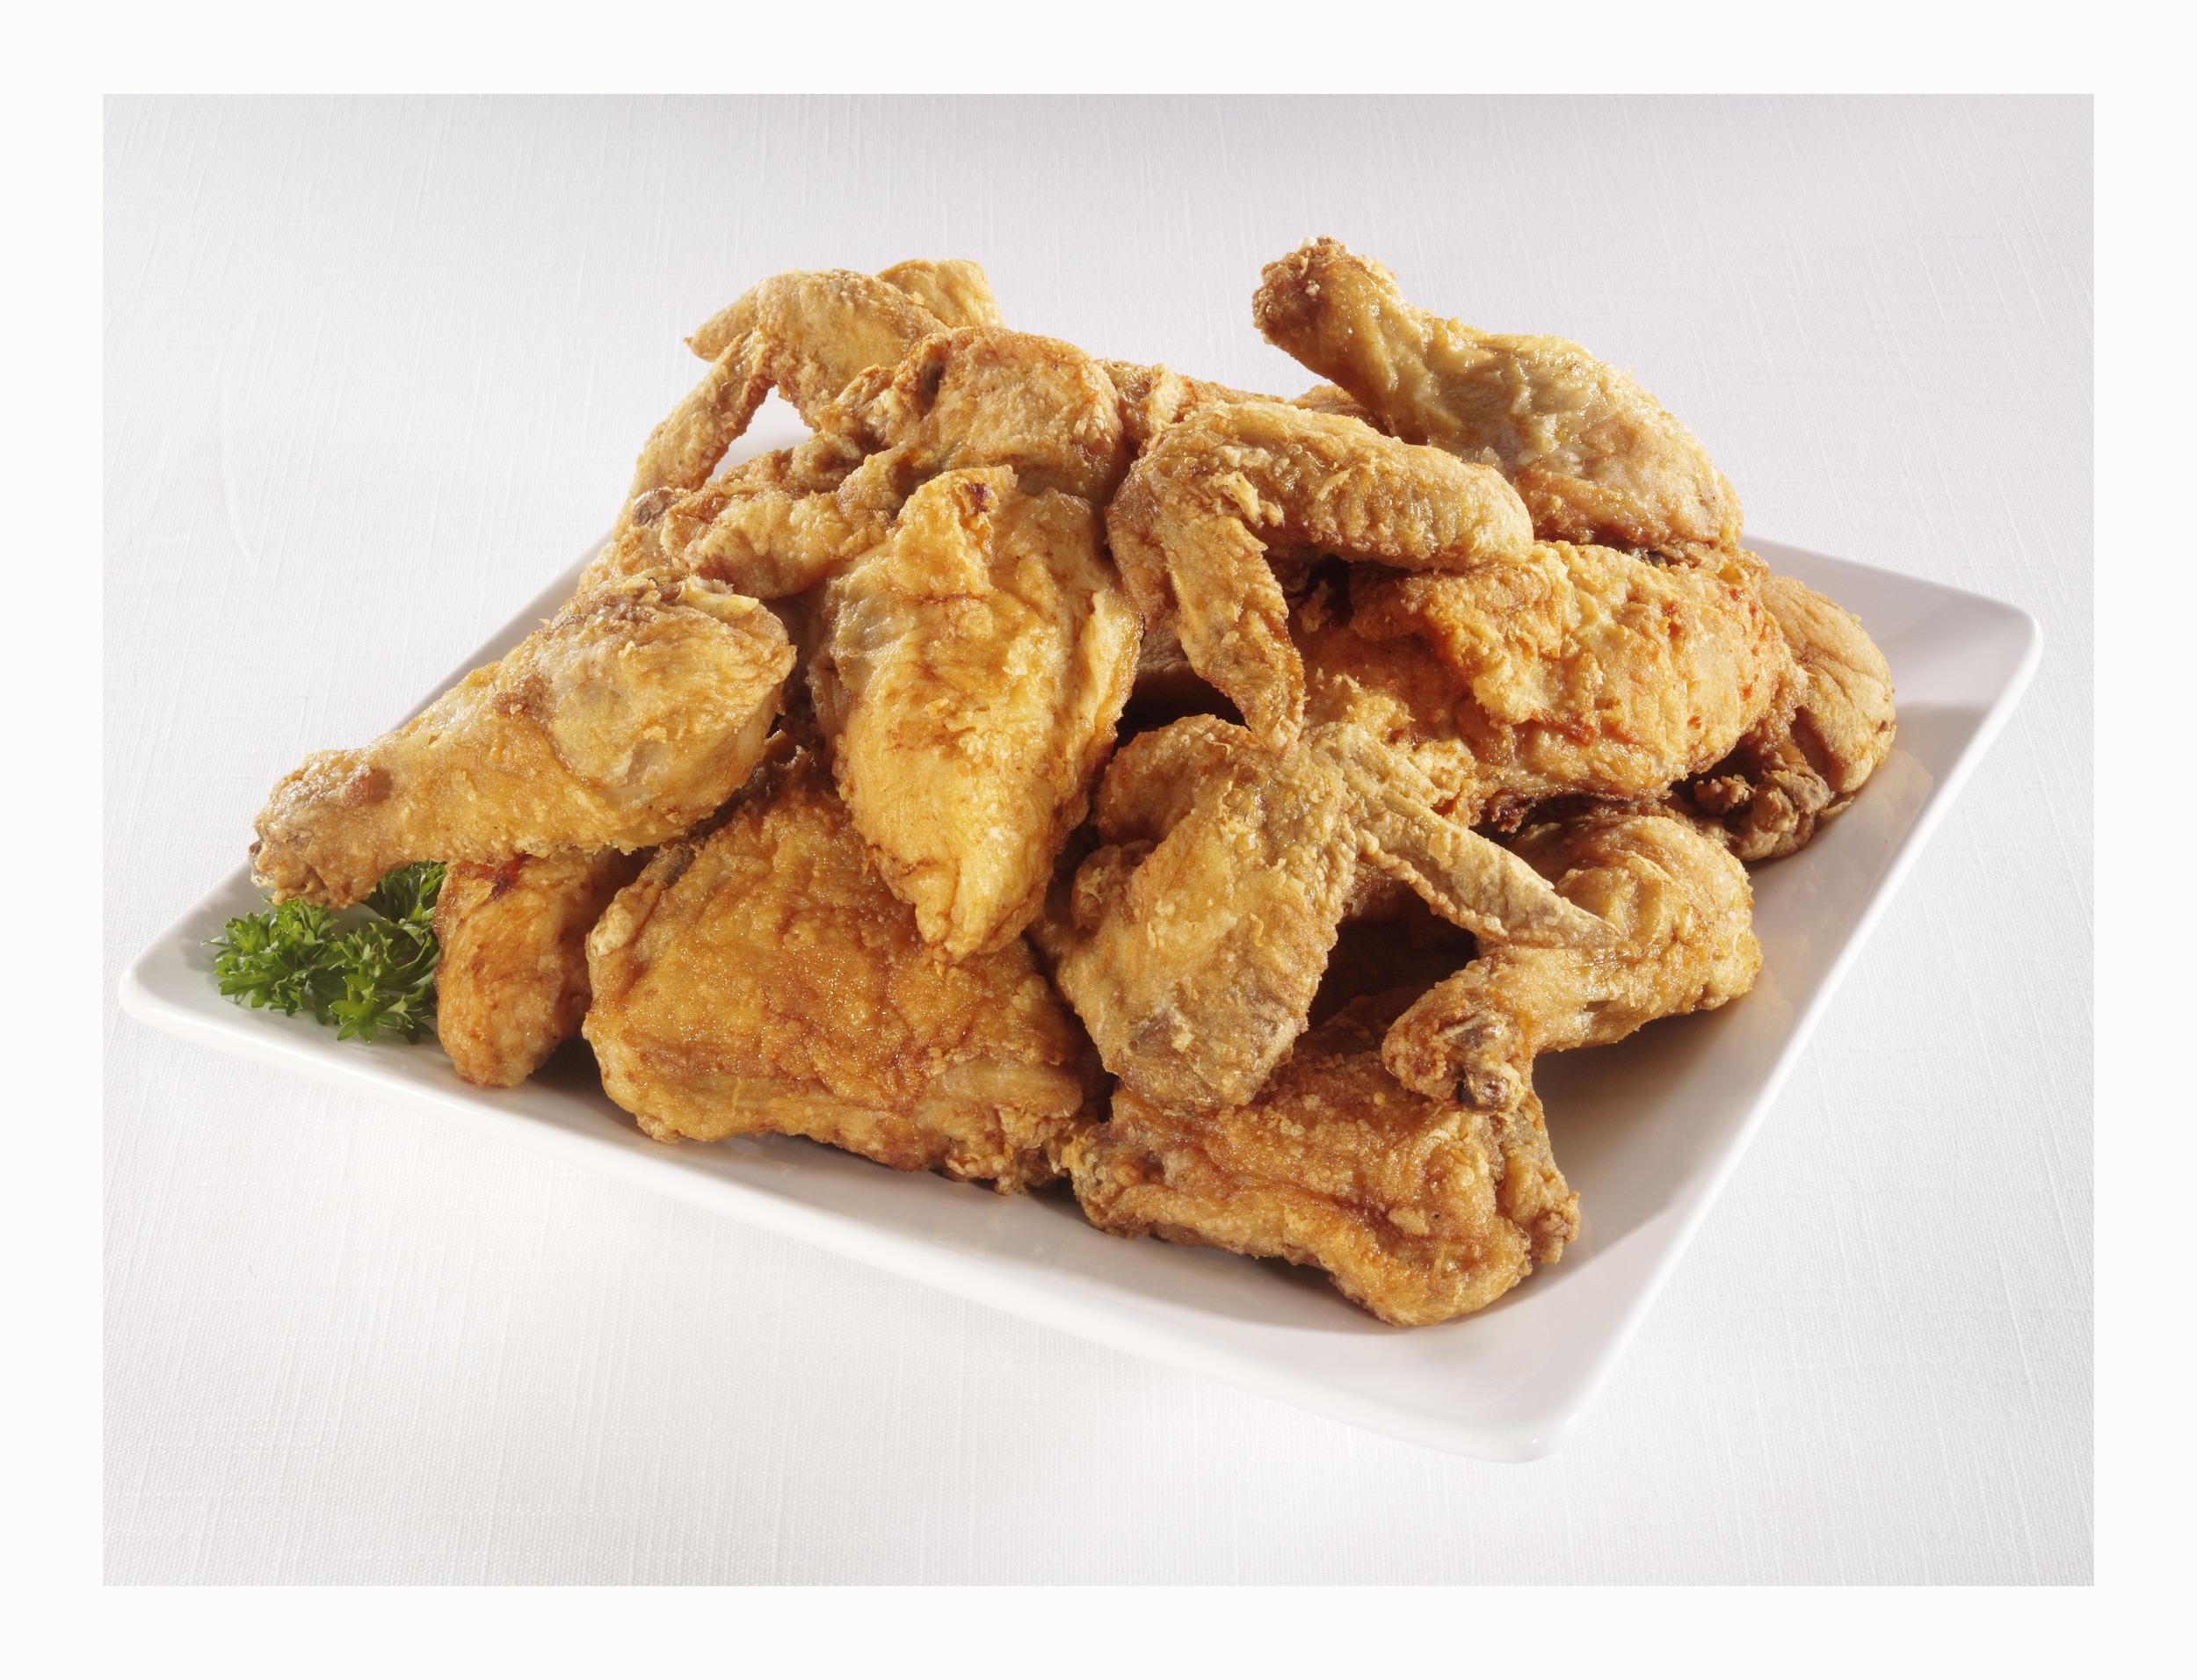 Genuine Broaster Chicken40-70% less fat than fried chicken